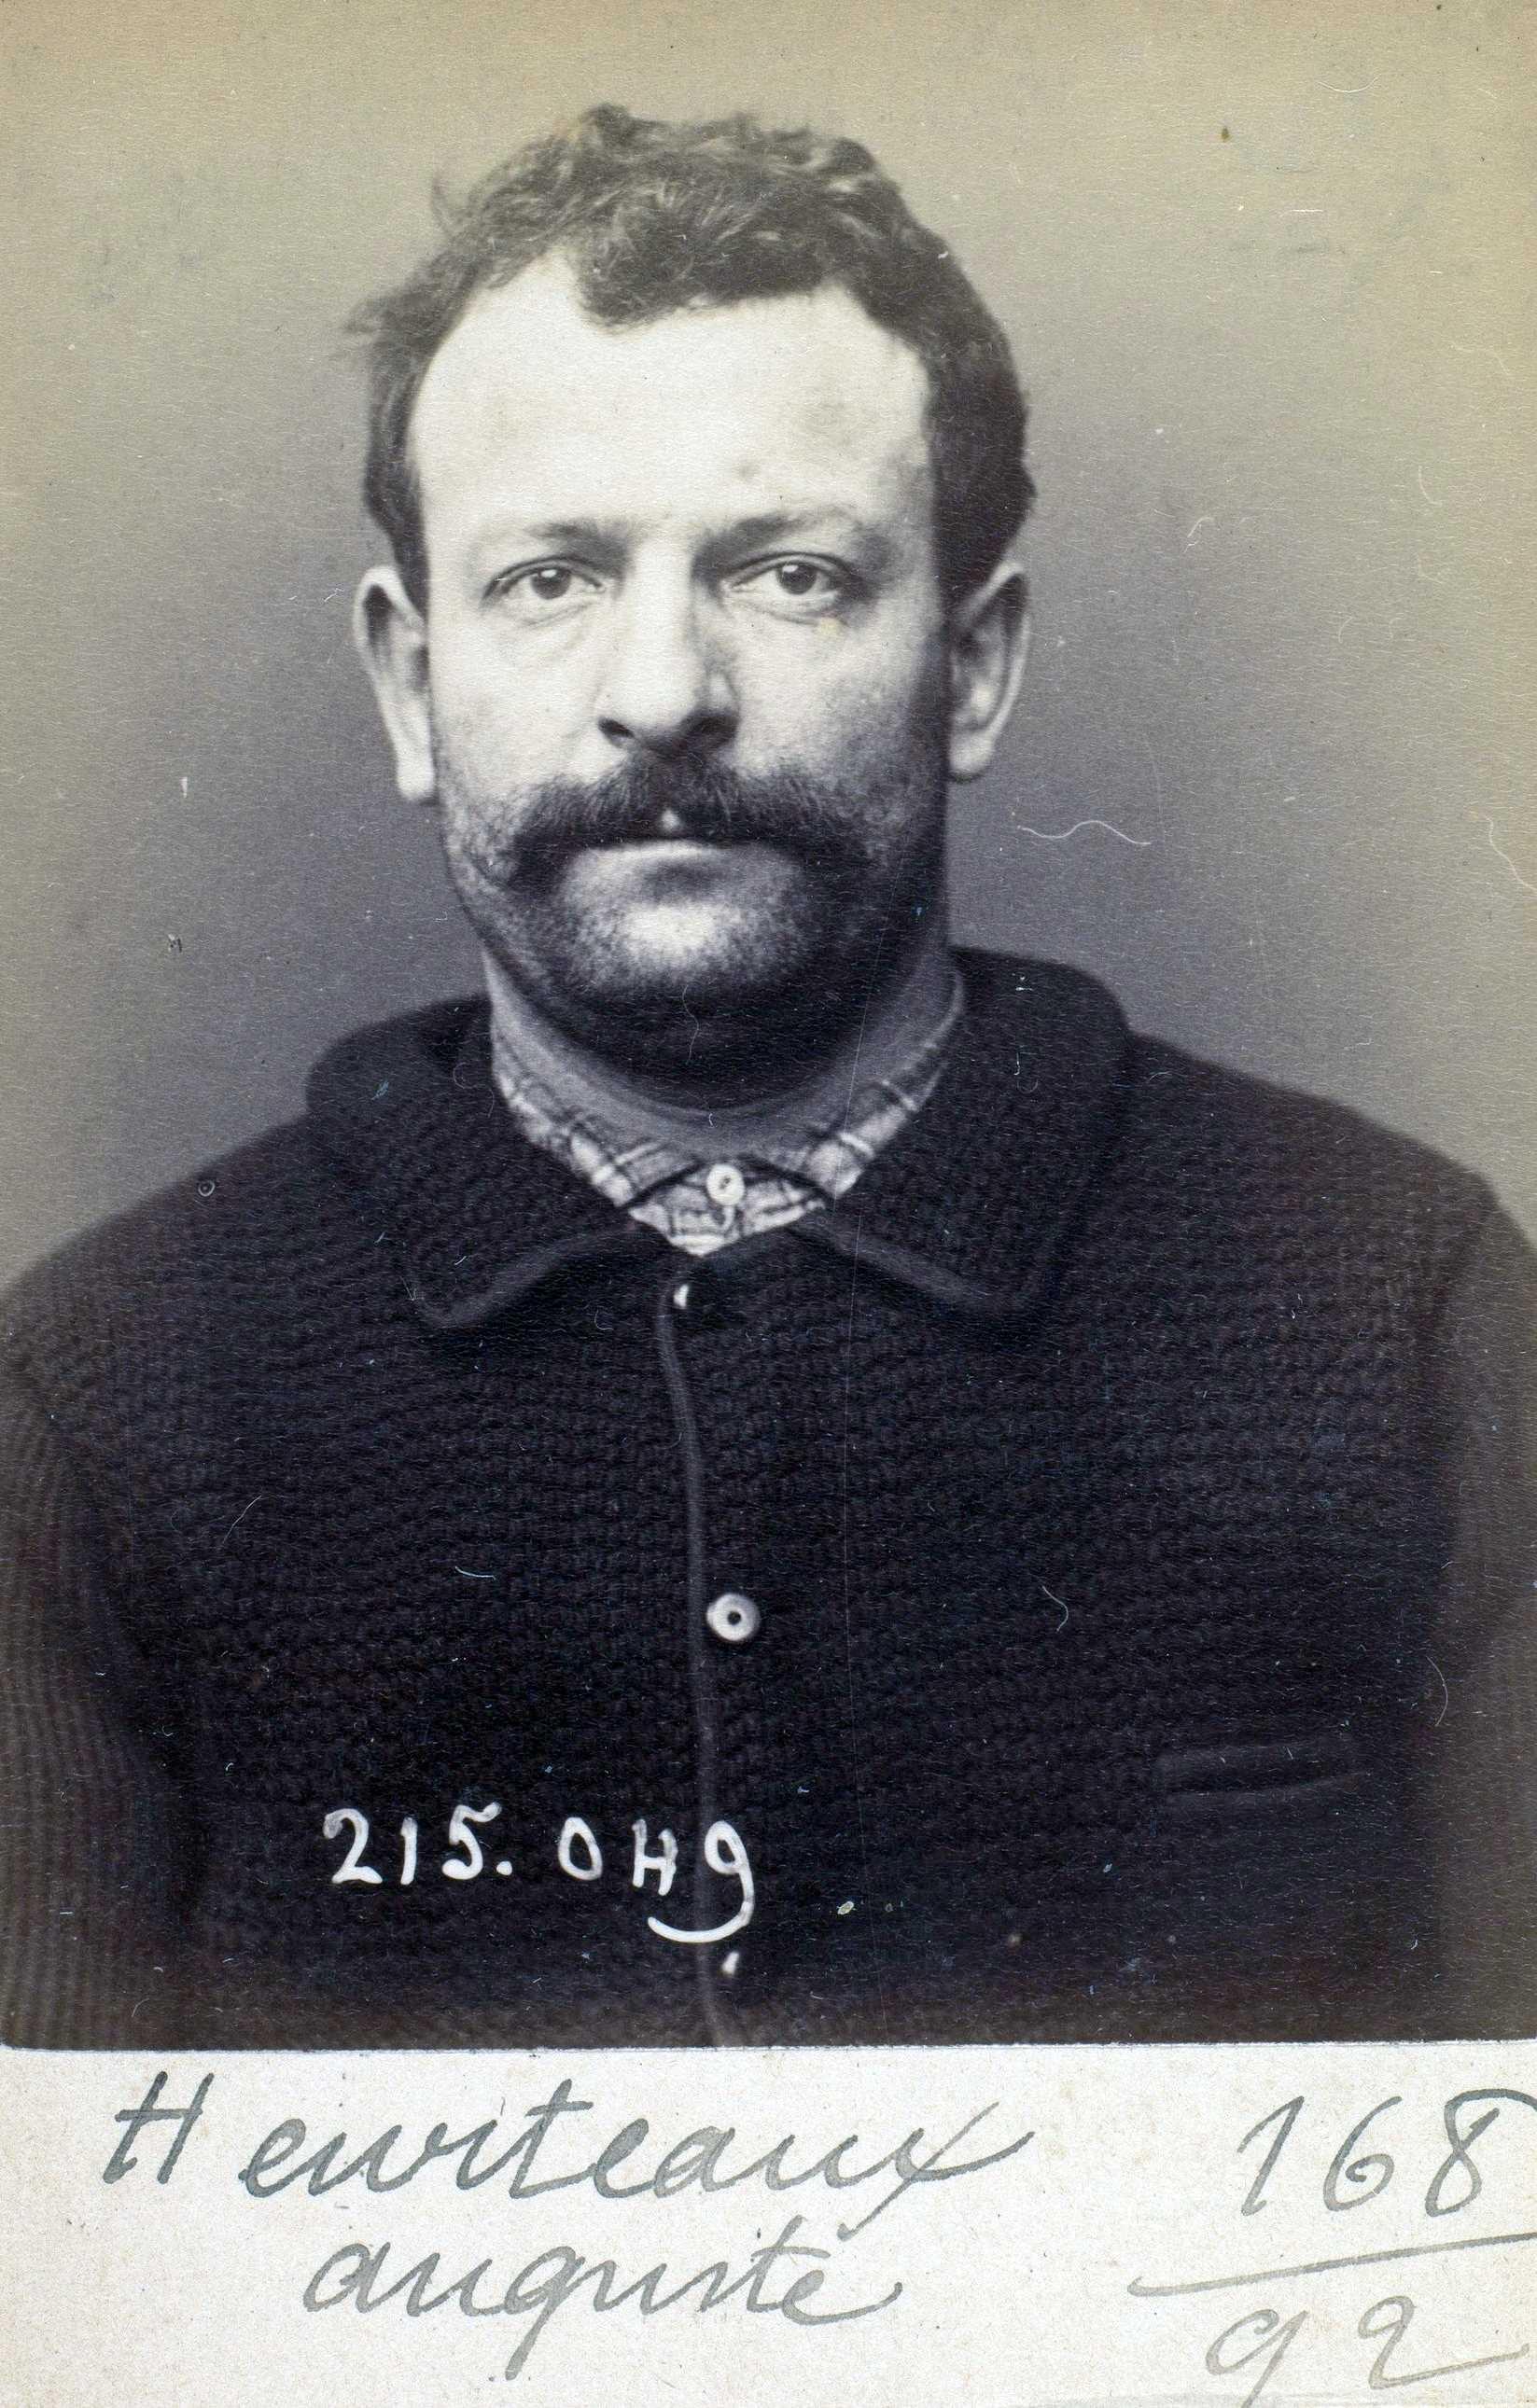 Foto policíaca d'Auguste Heurteaux (3 de març de 1894)